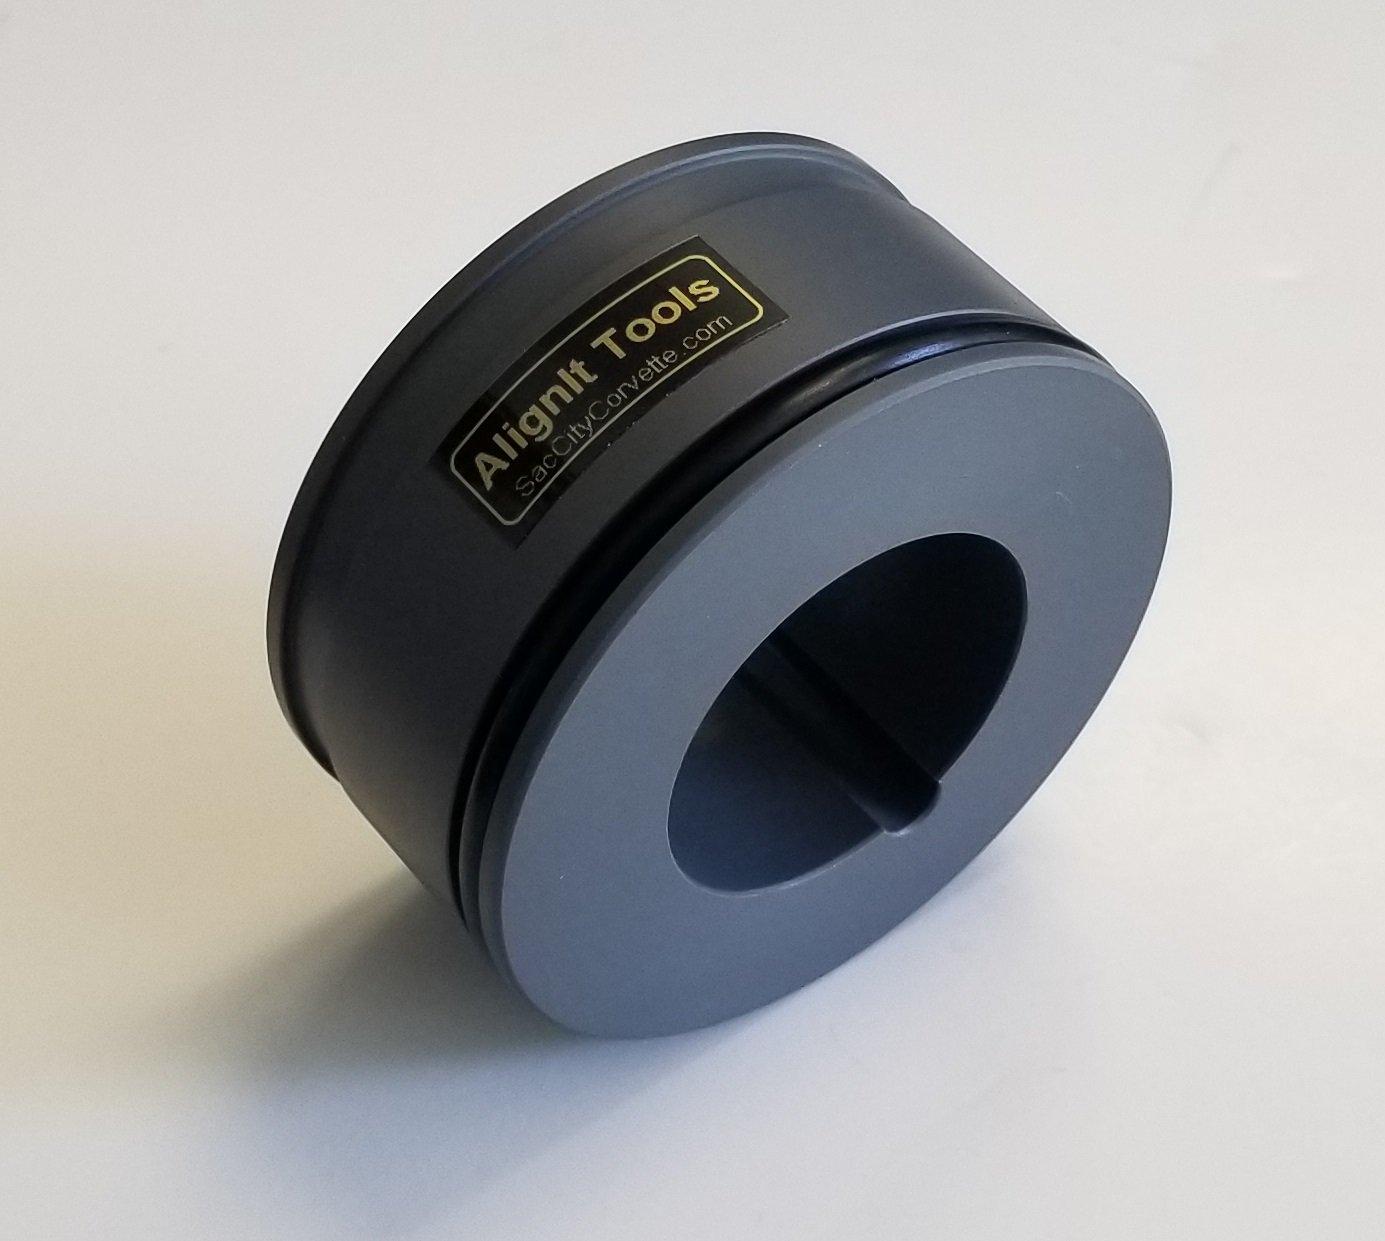 SacCityCorvette LS PVC Timing & Rear Main Cover Alignment Tools & Seal Installer GM Gen III & IV Engines LS1-2-3-6-7-9-LQ4-LQ9-4.8L-5.3L-6.0L-6.2L & More by SacCityCorvette (Image #3)